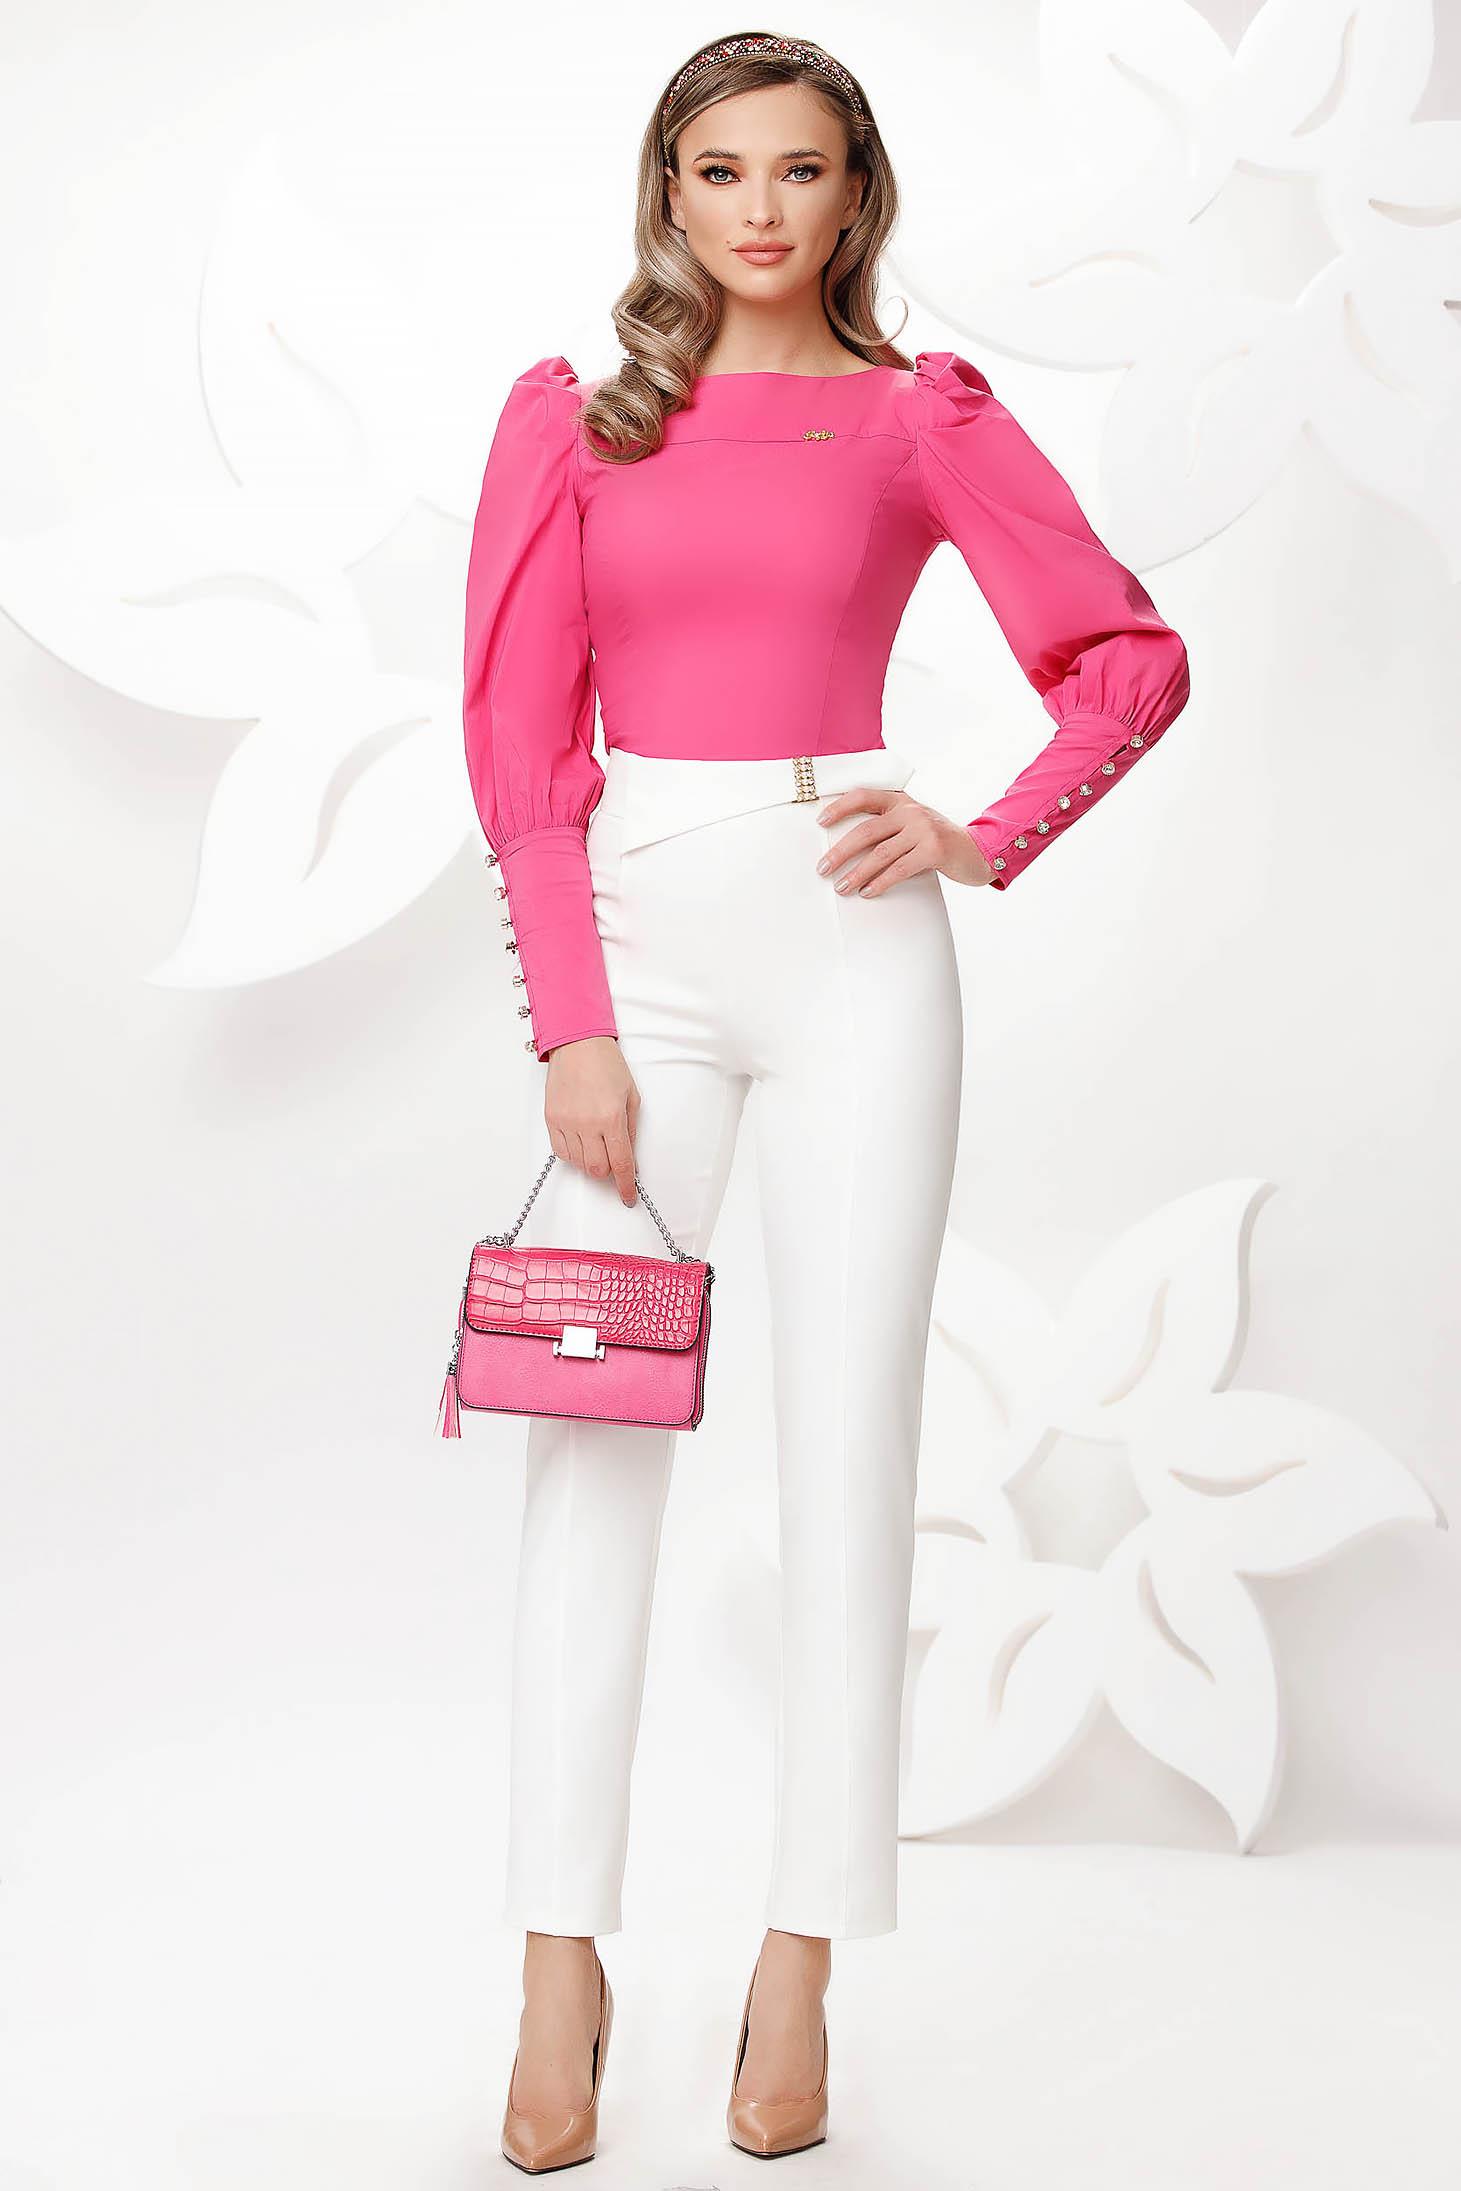 White trousers straight elegant slightly transparent fabric slightly elastic fabric